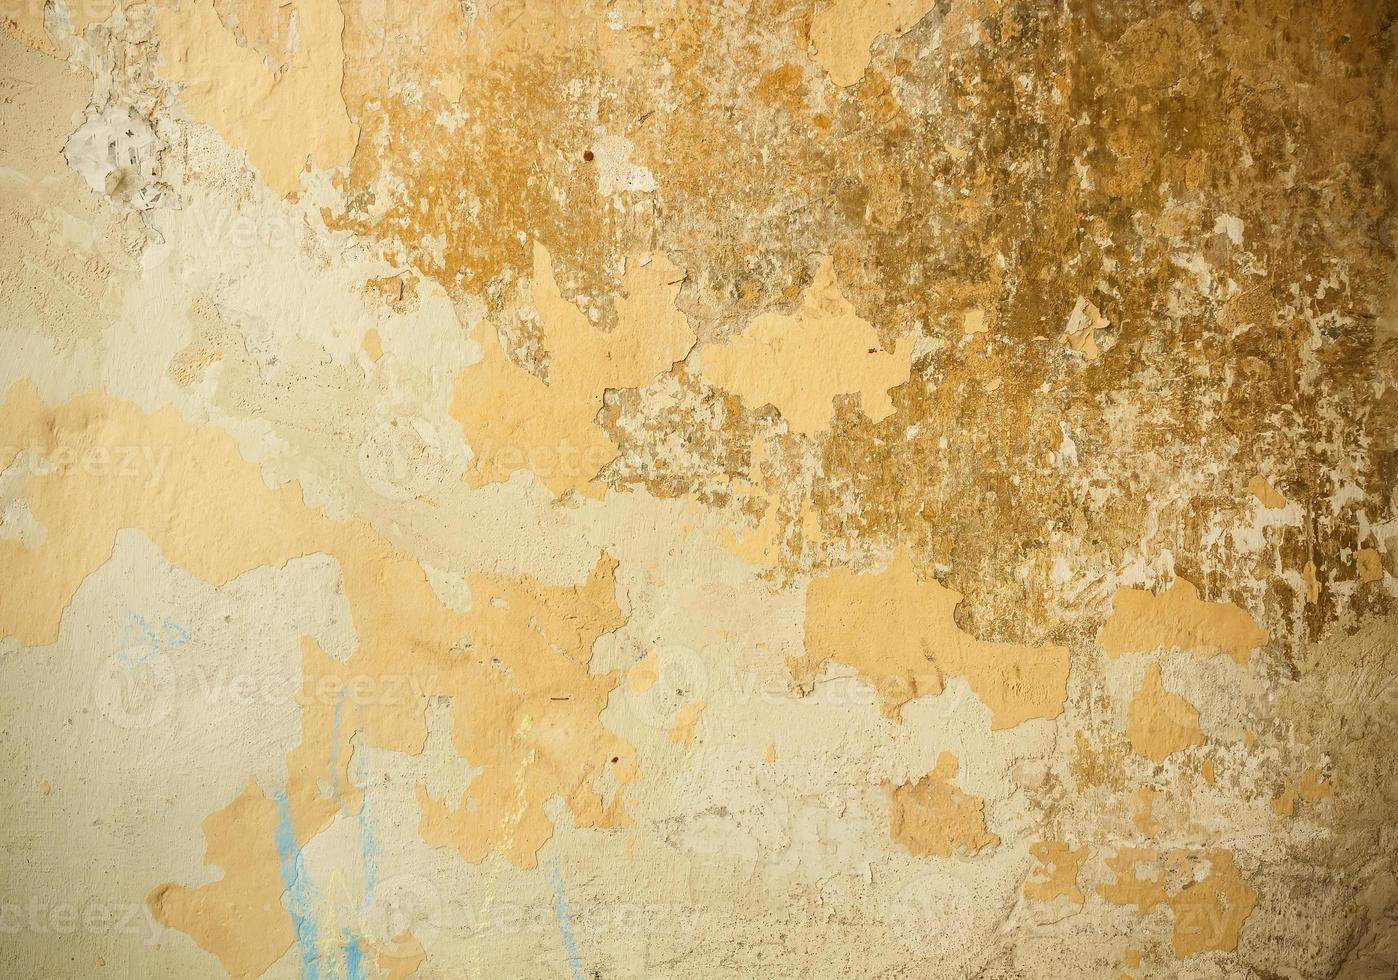 pared de yeso antiguo foto